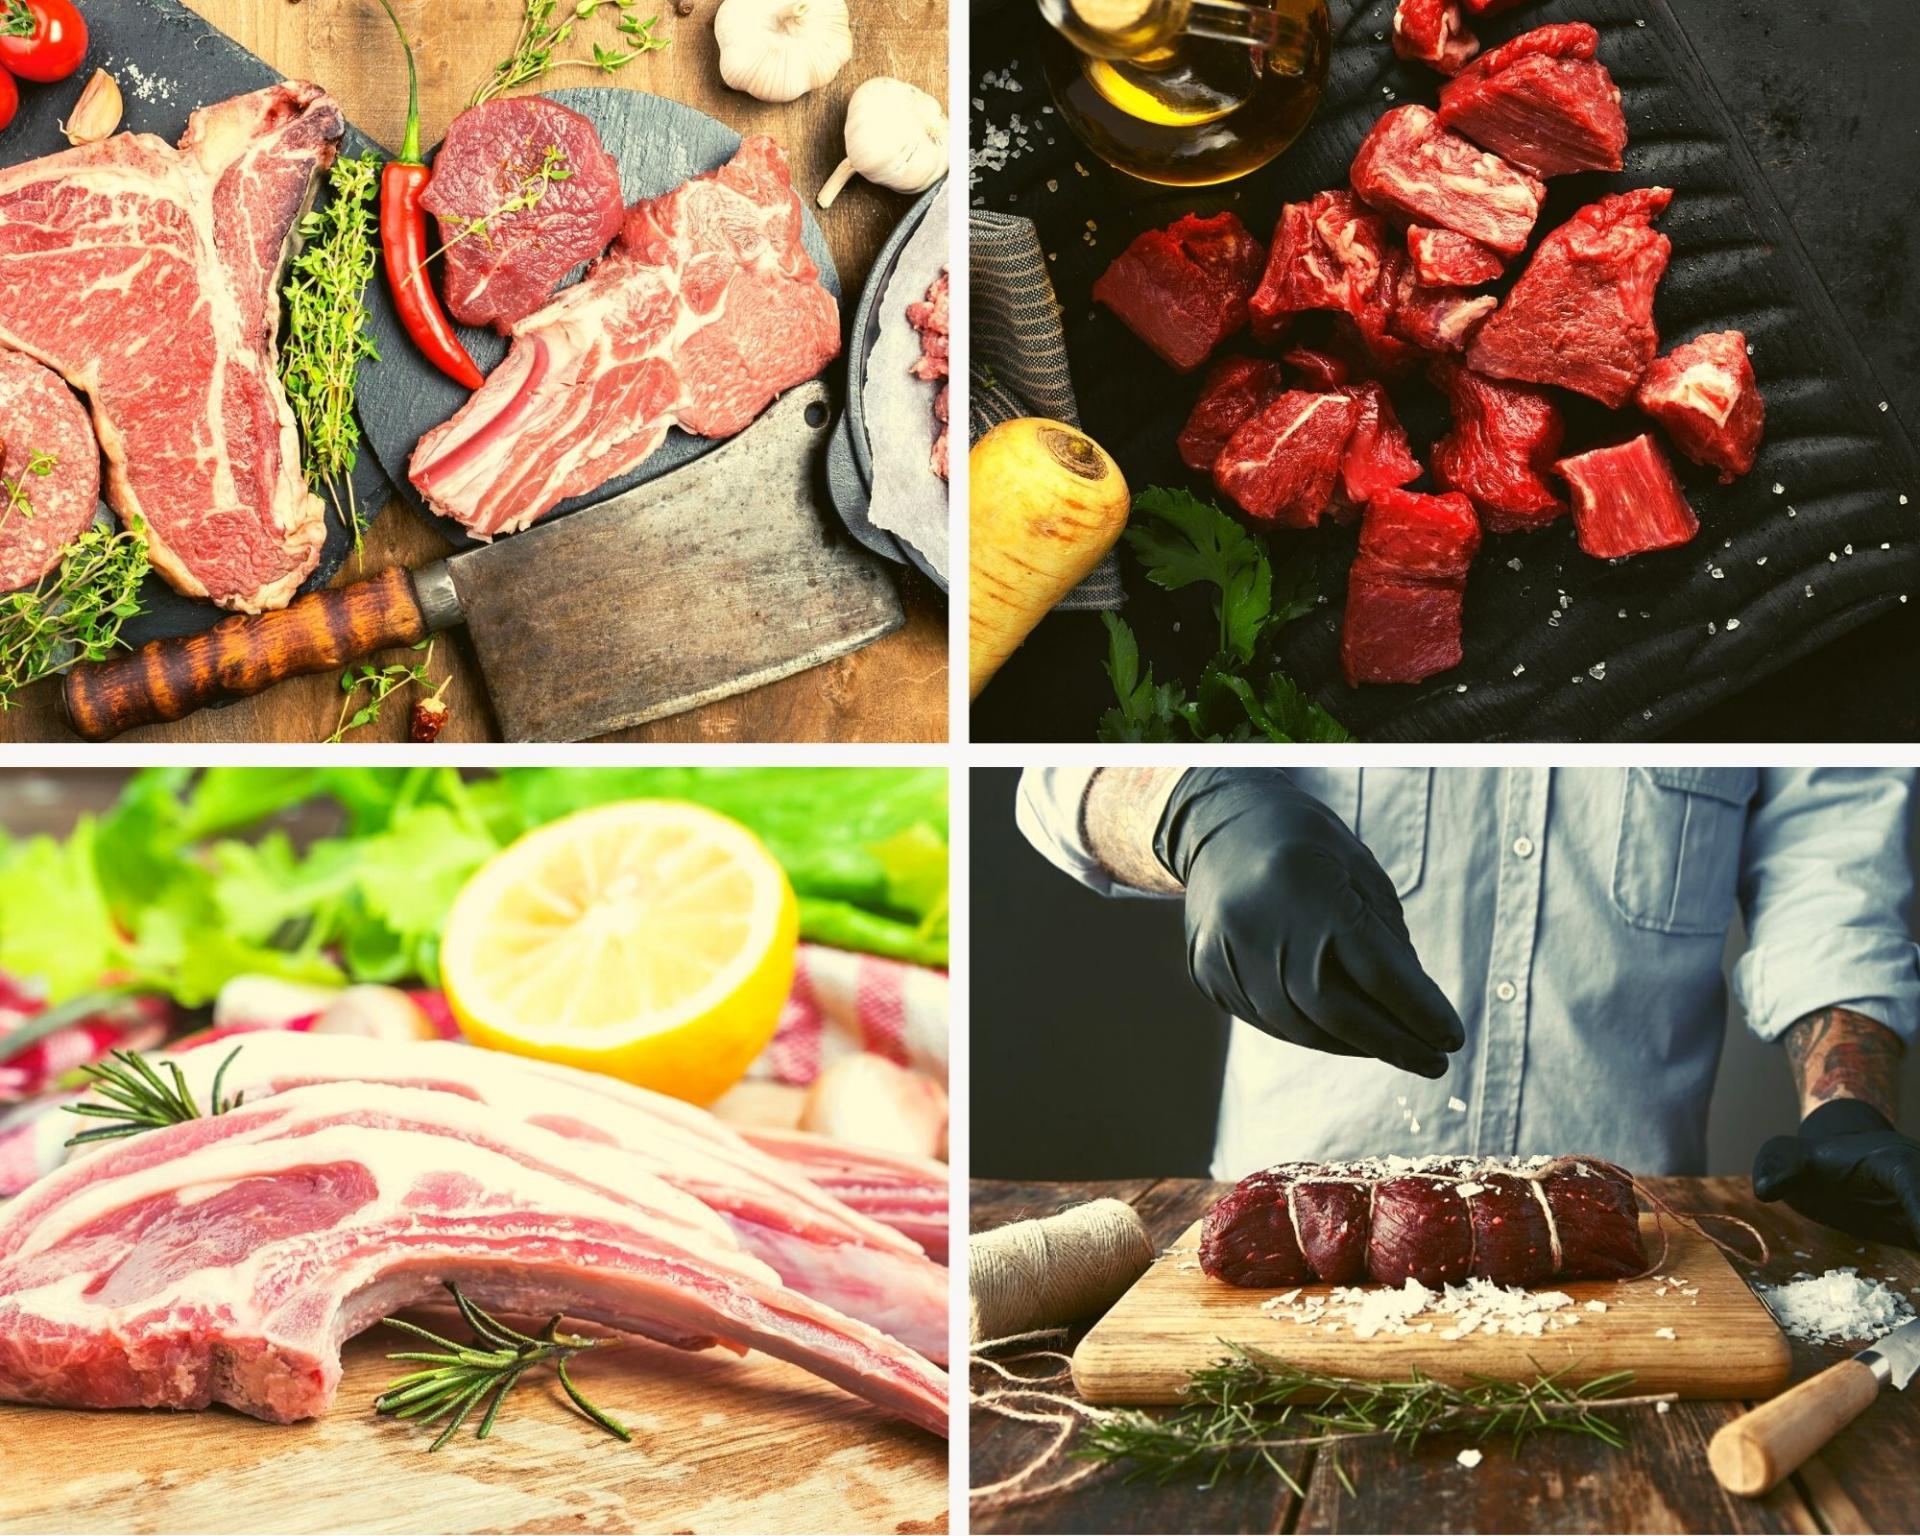 Boucherie-fraiche-viande-qualite - terroir - perche